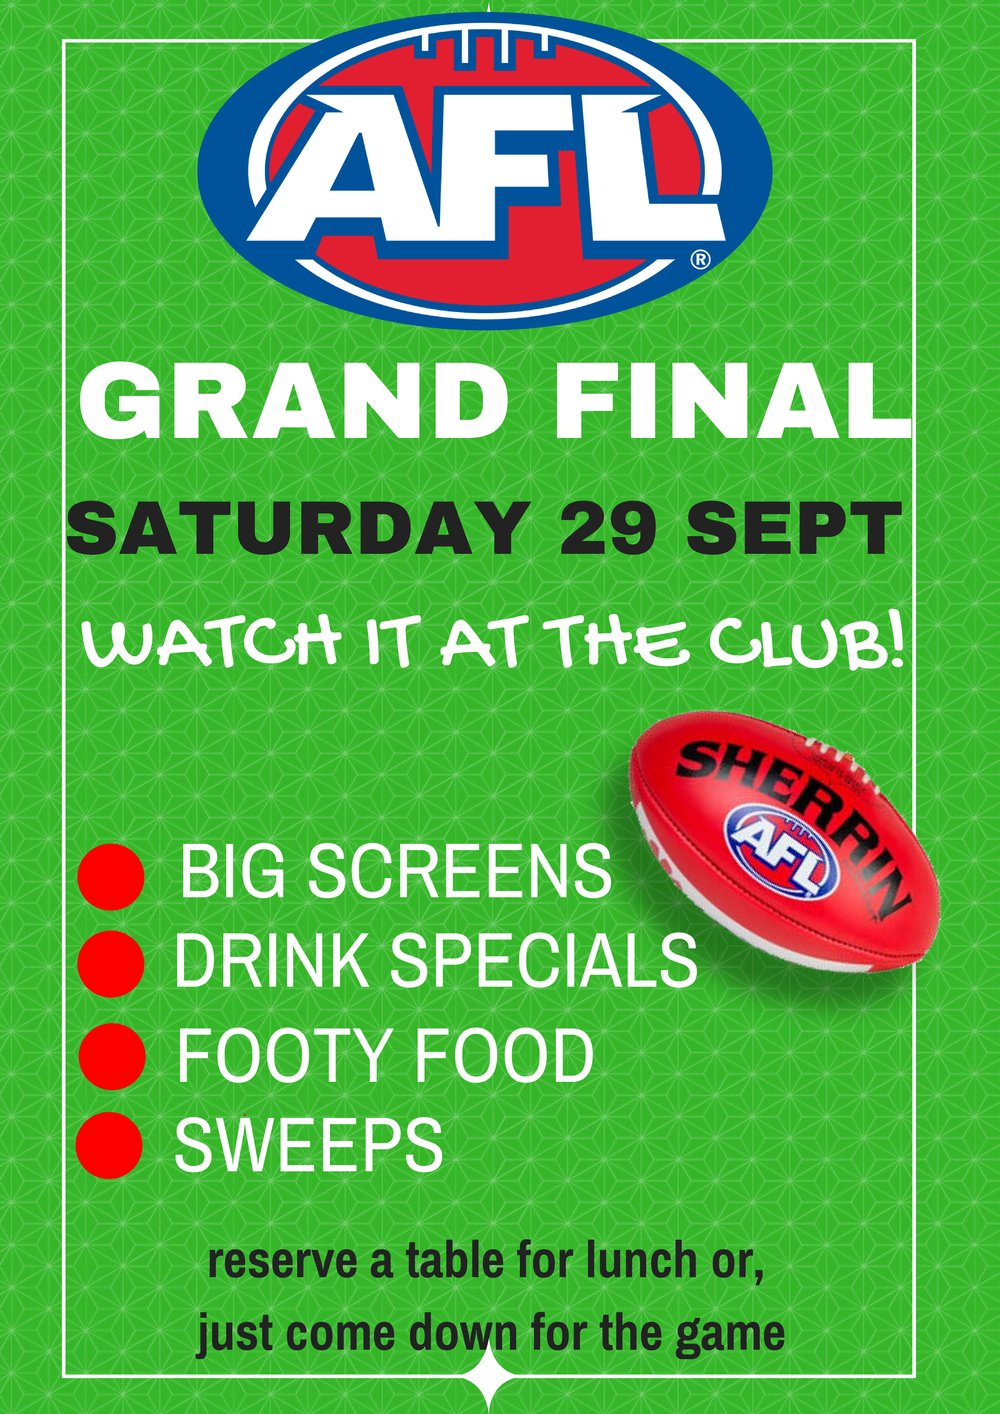 AFL GRAND FINAL.jpg